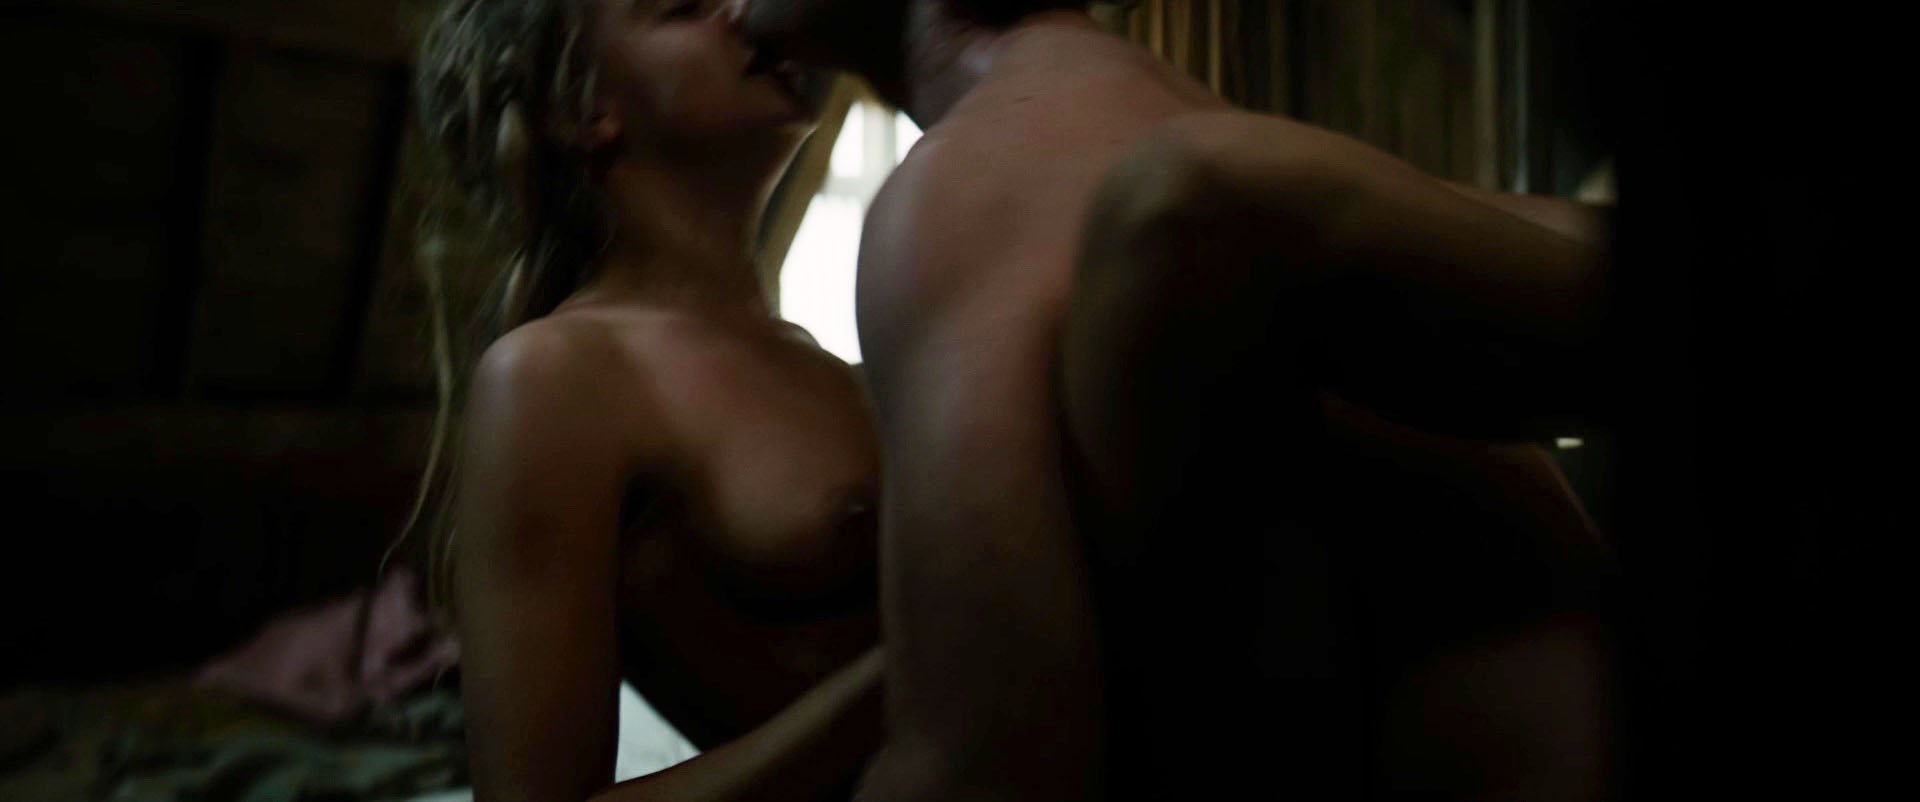 Cara Delevingne nude - Tulip Fever (2017)